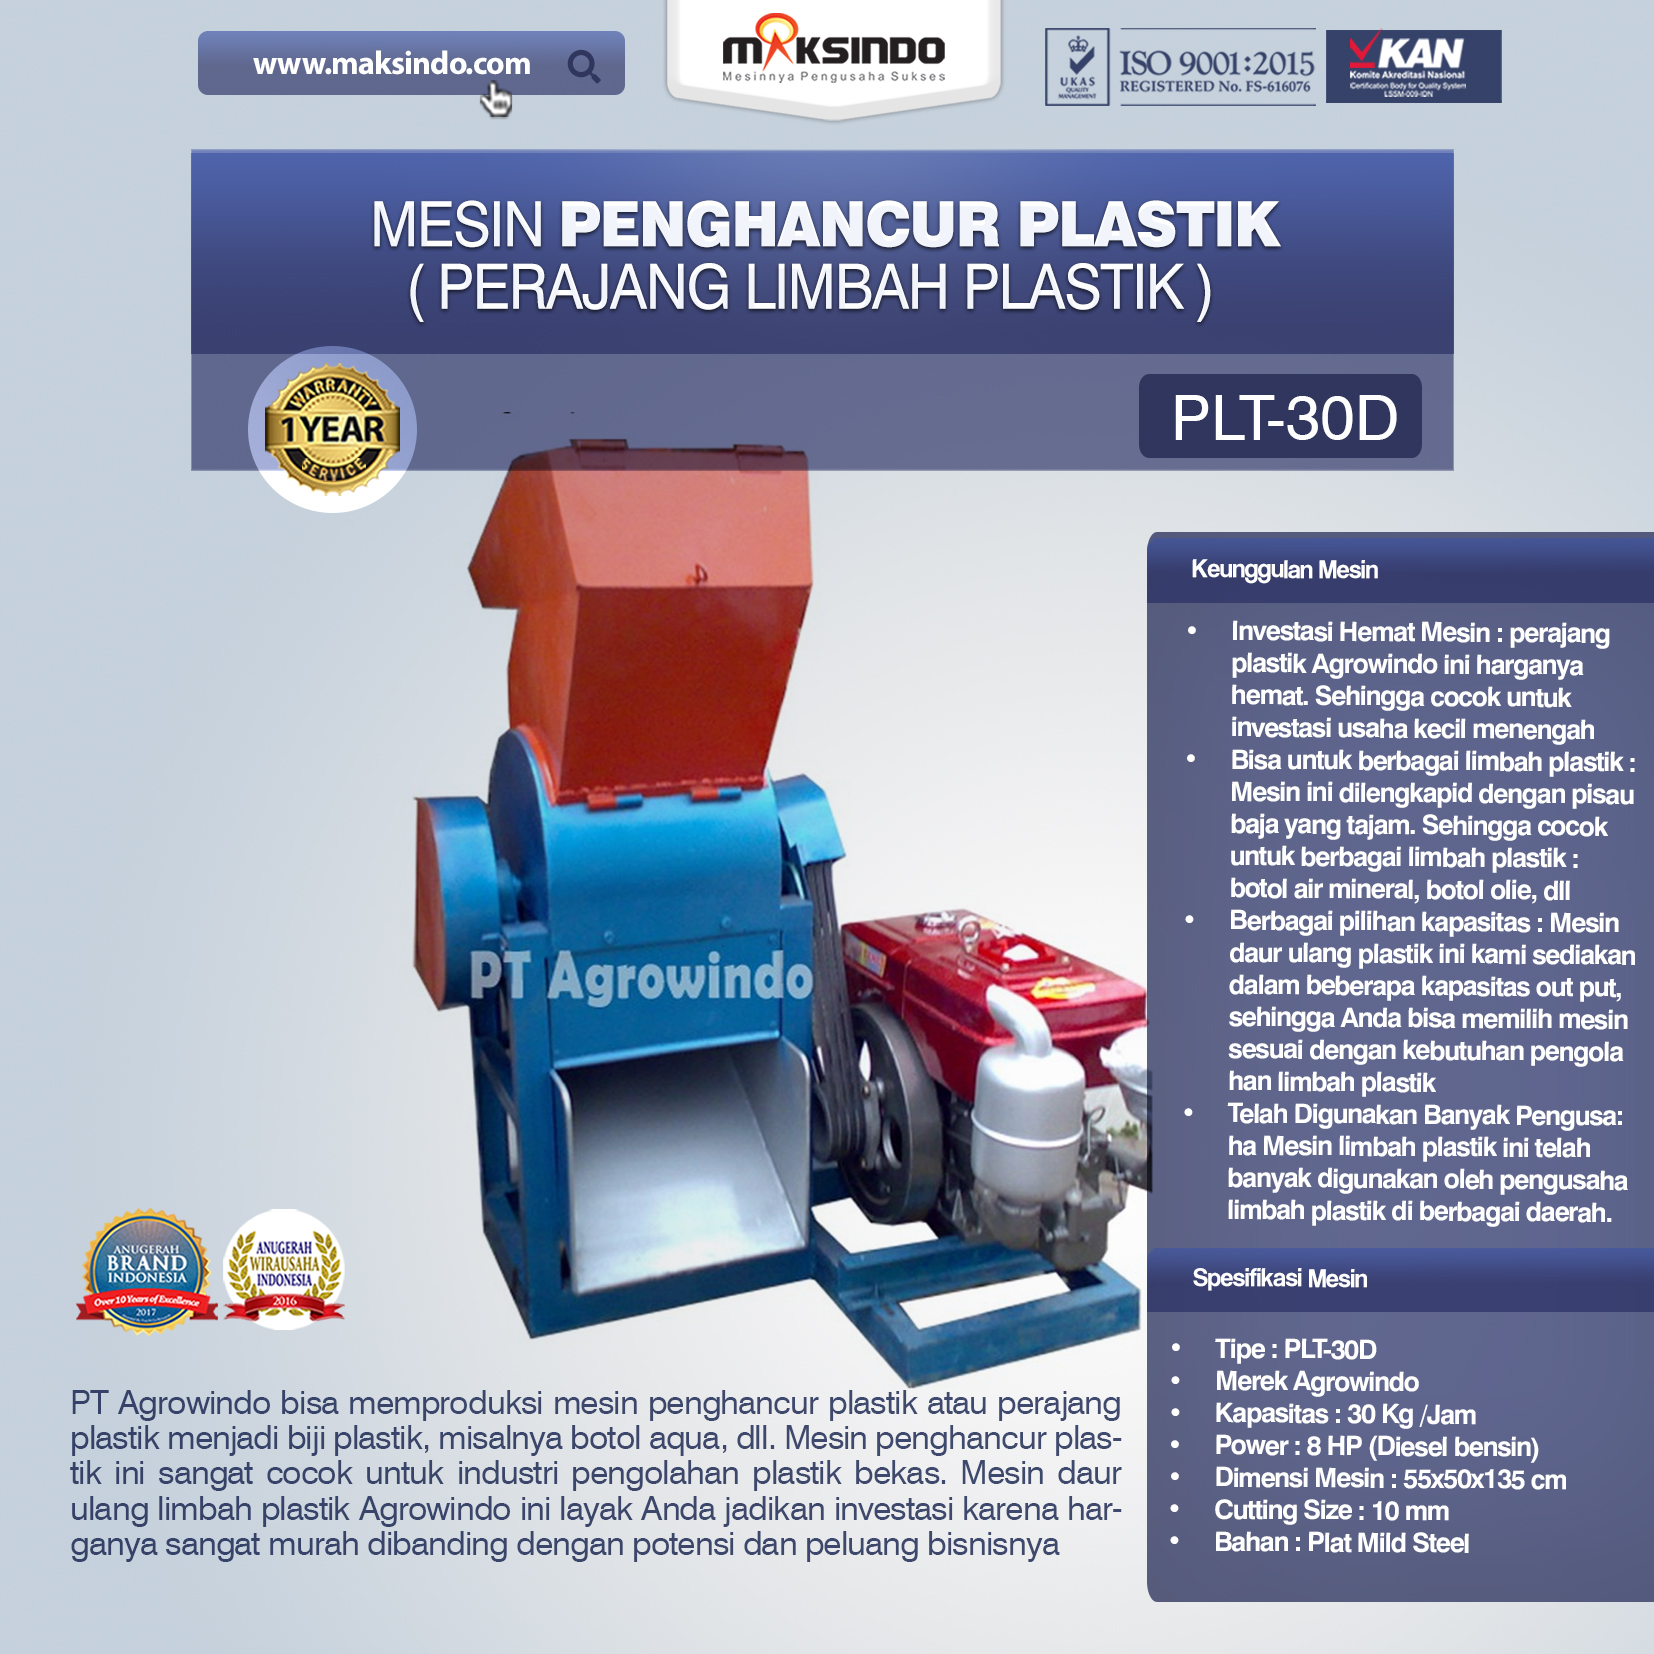 mesin penghancur plastik PLT-30D